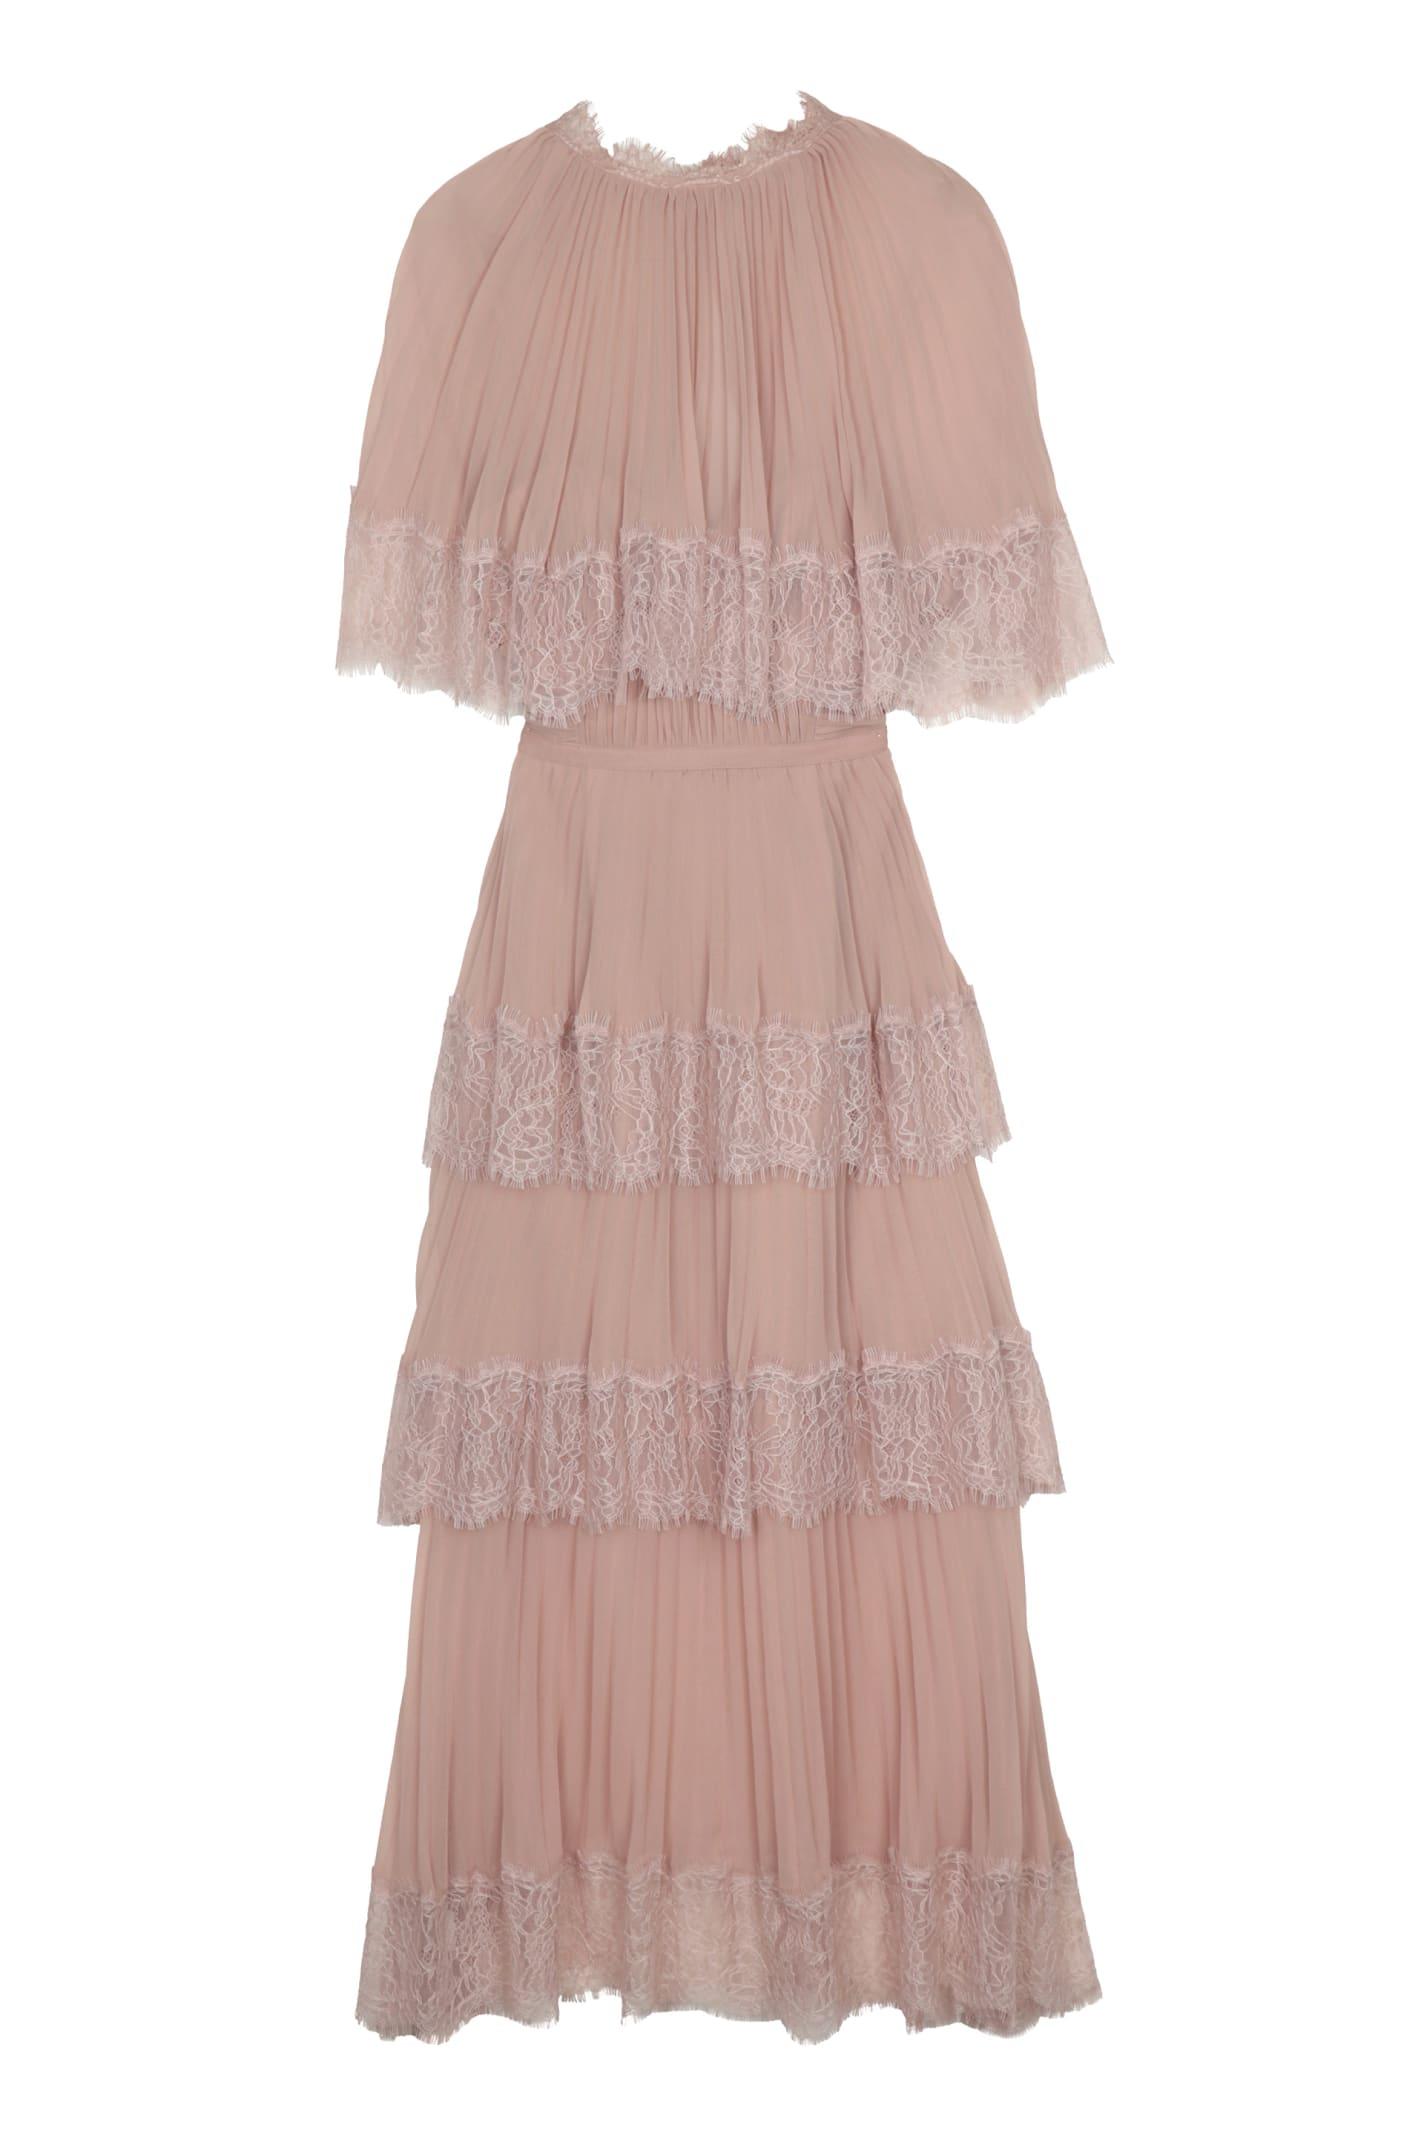 Buy self-portrait Lace Trim Chiffon Dress online, shop self-portrait with free shipping